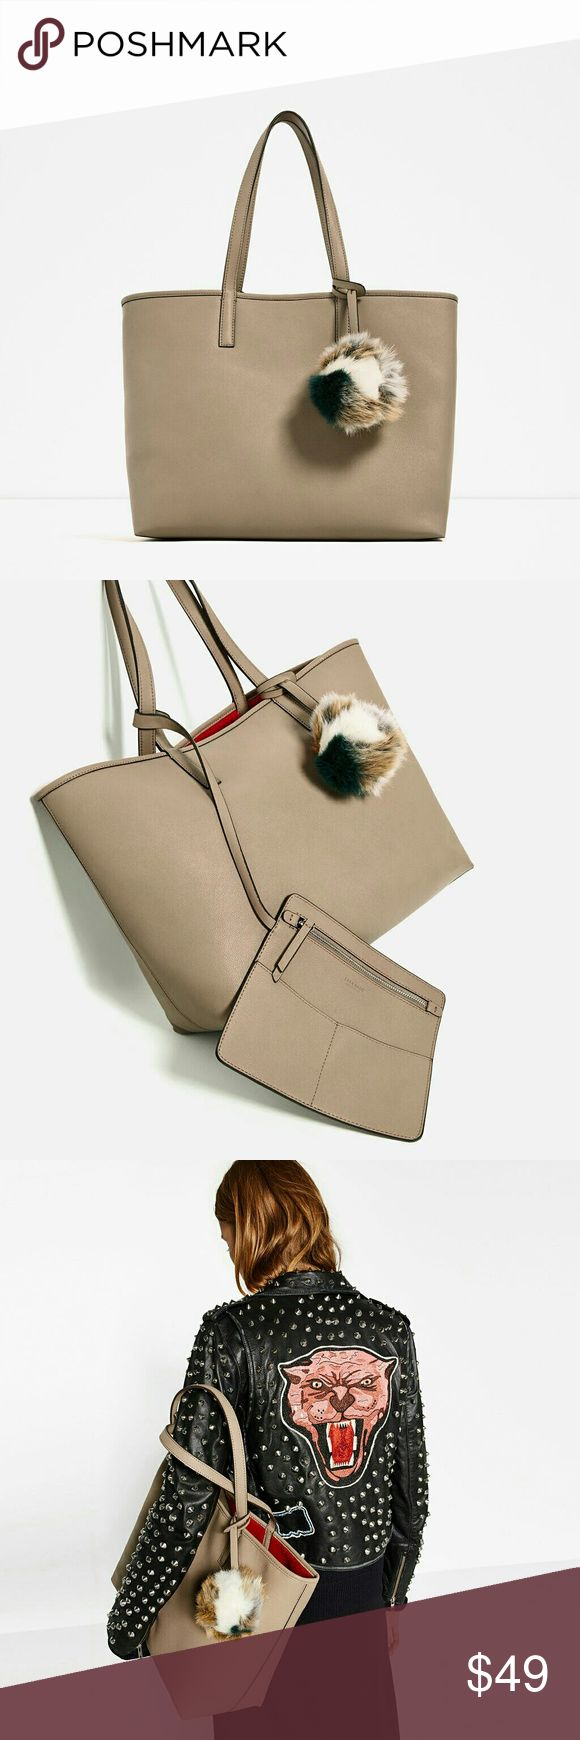 Zara Reversible Tote Bag Authentic Zara Tote Bag. Brand new with tags in original dustbag. Zara Bags Totes